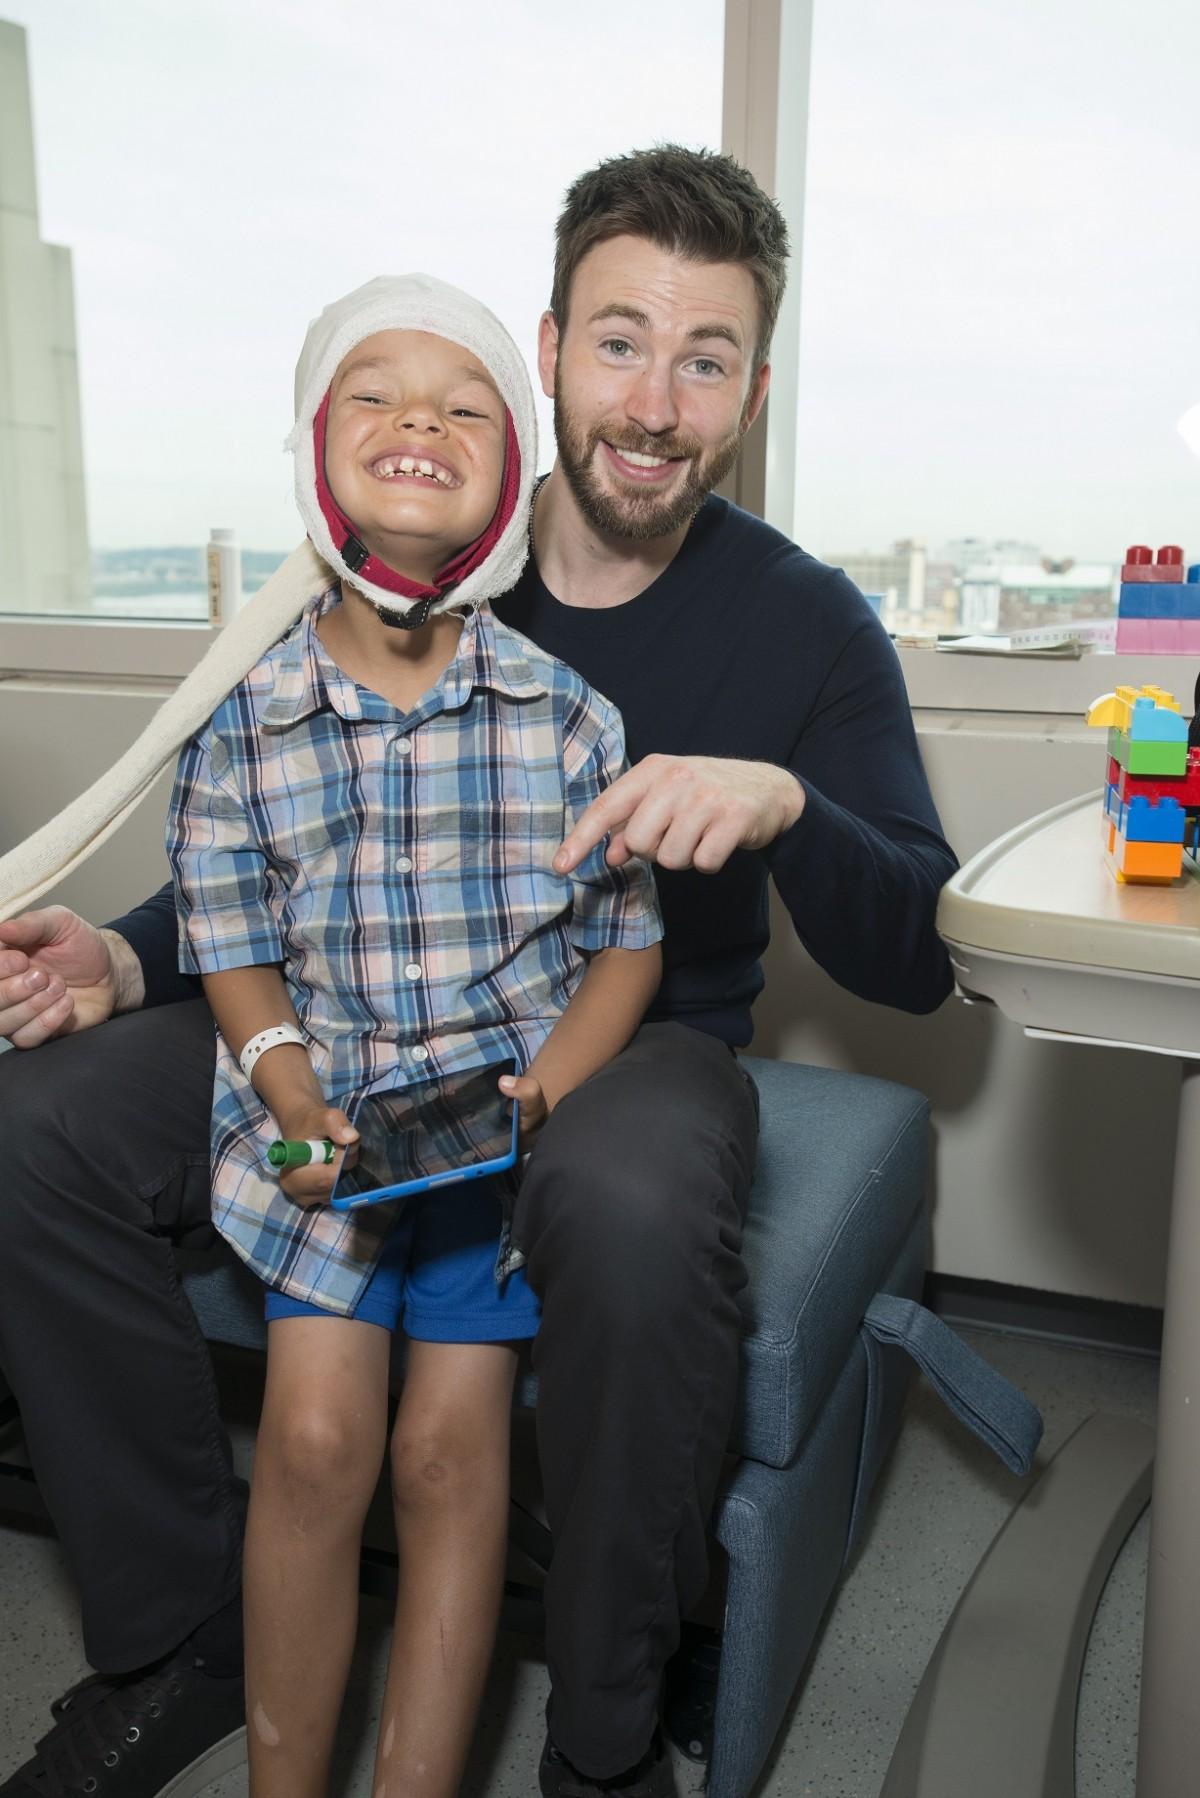 Jude Langstaff and Chris Evans